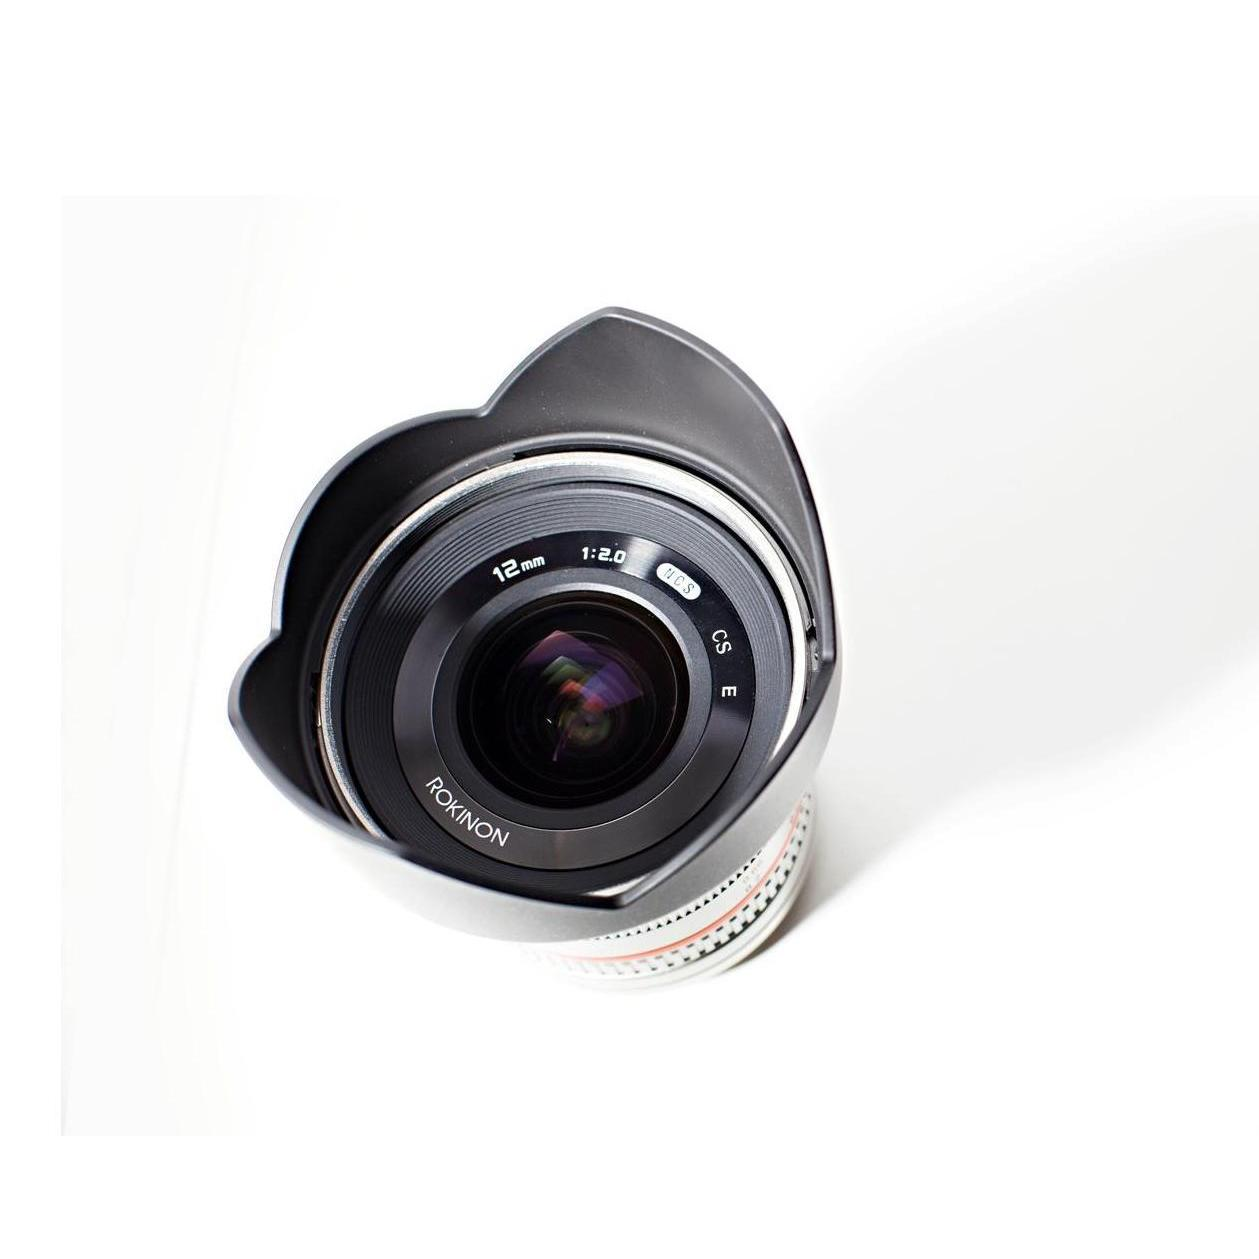 Rokinon 12mm F2 0 NCS CS Ultra Wide Angle Lens